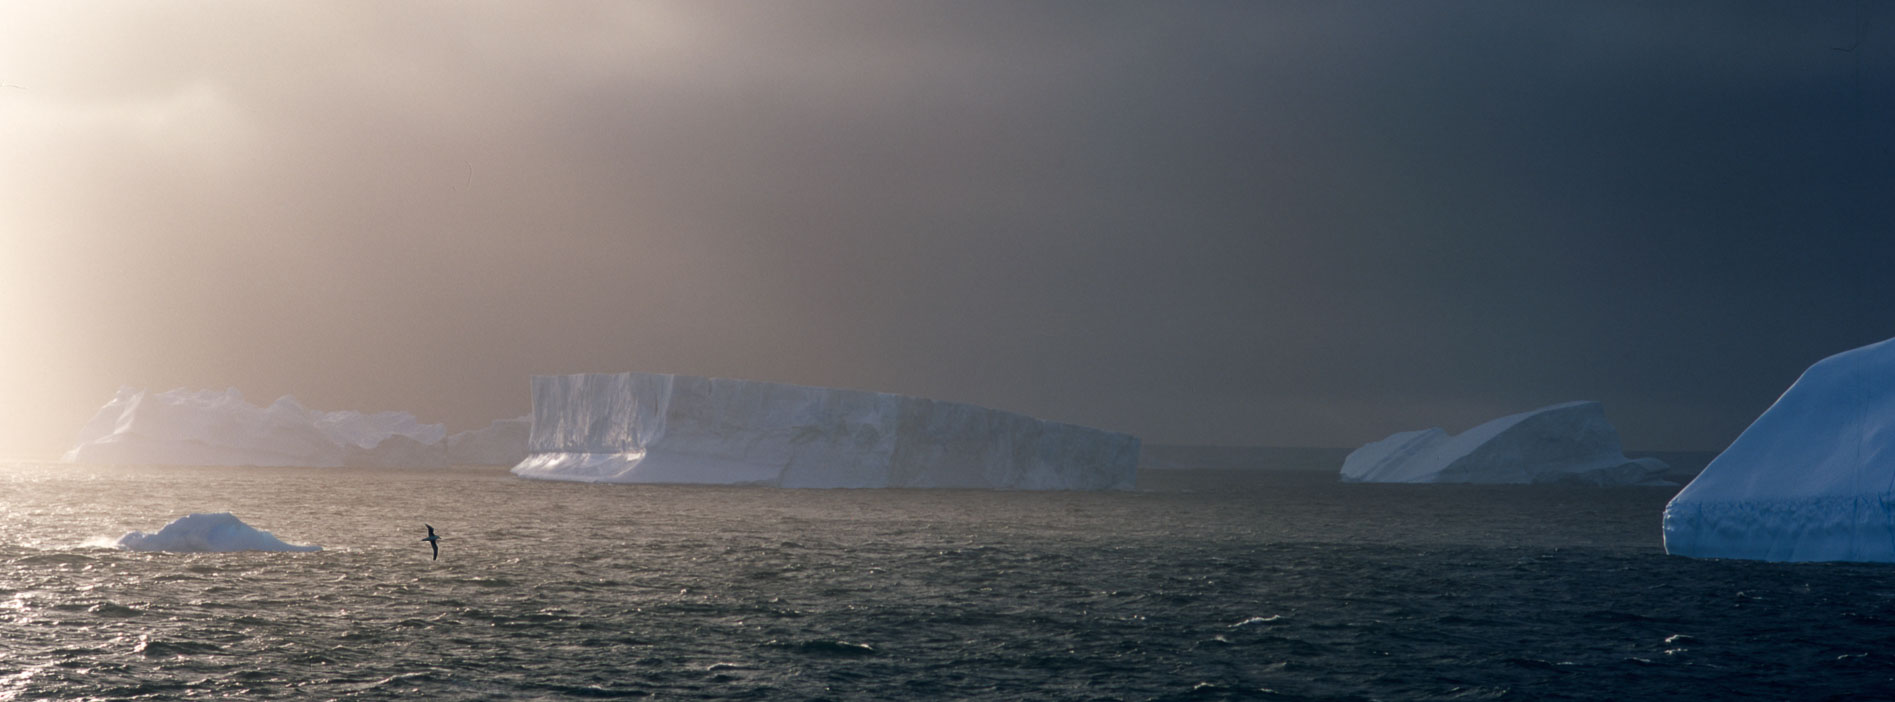 orkney10a.jpg